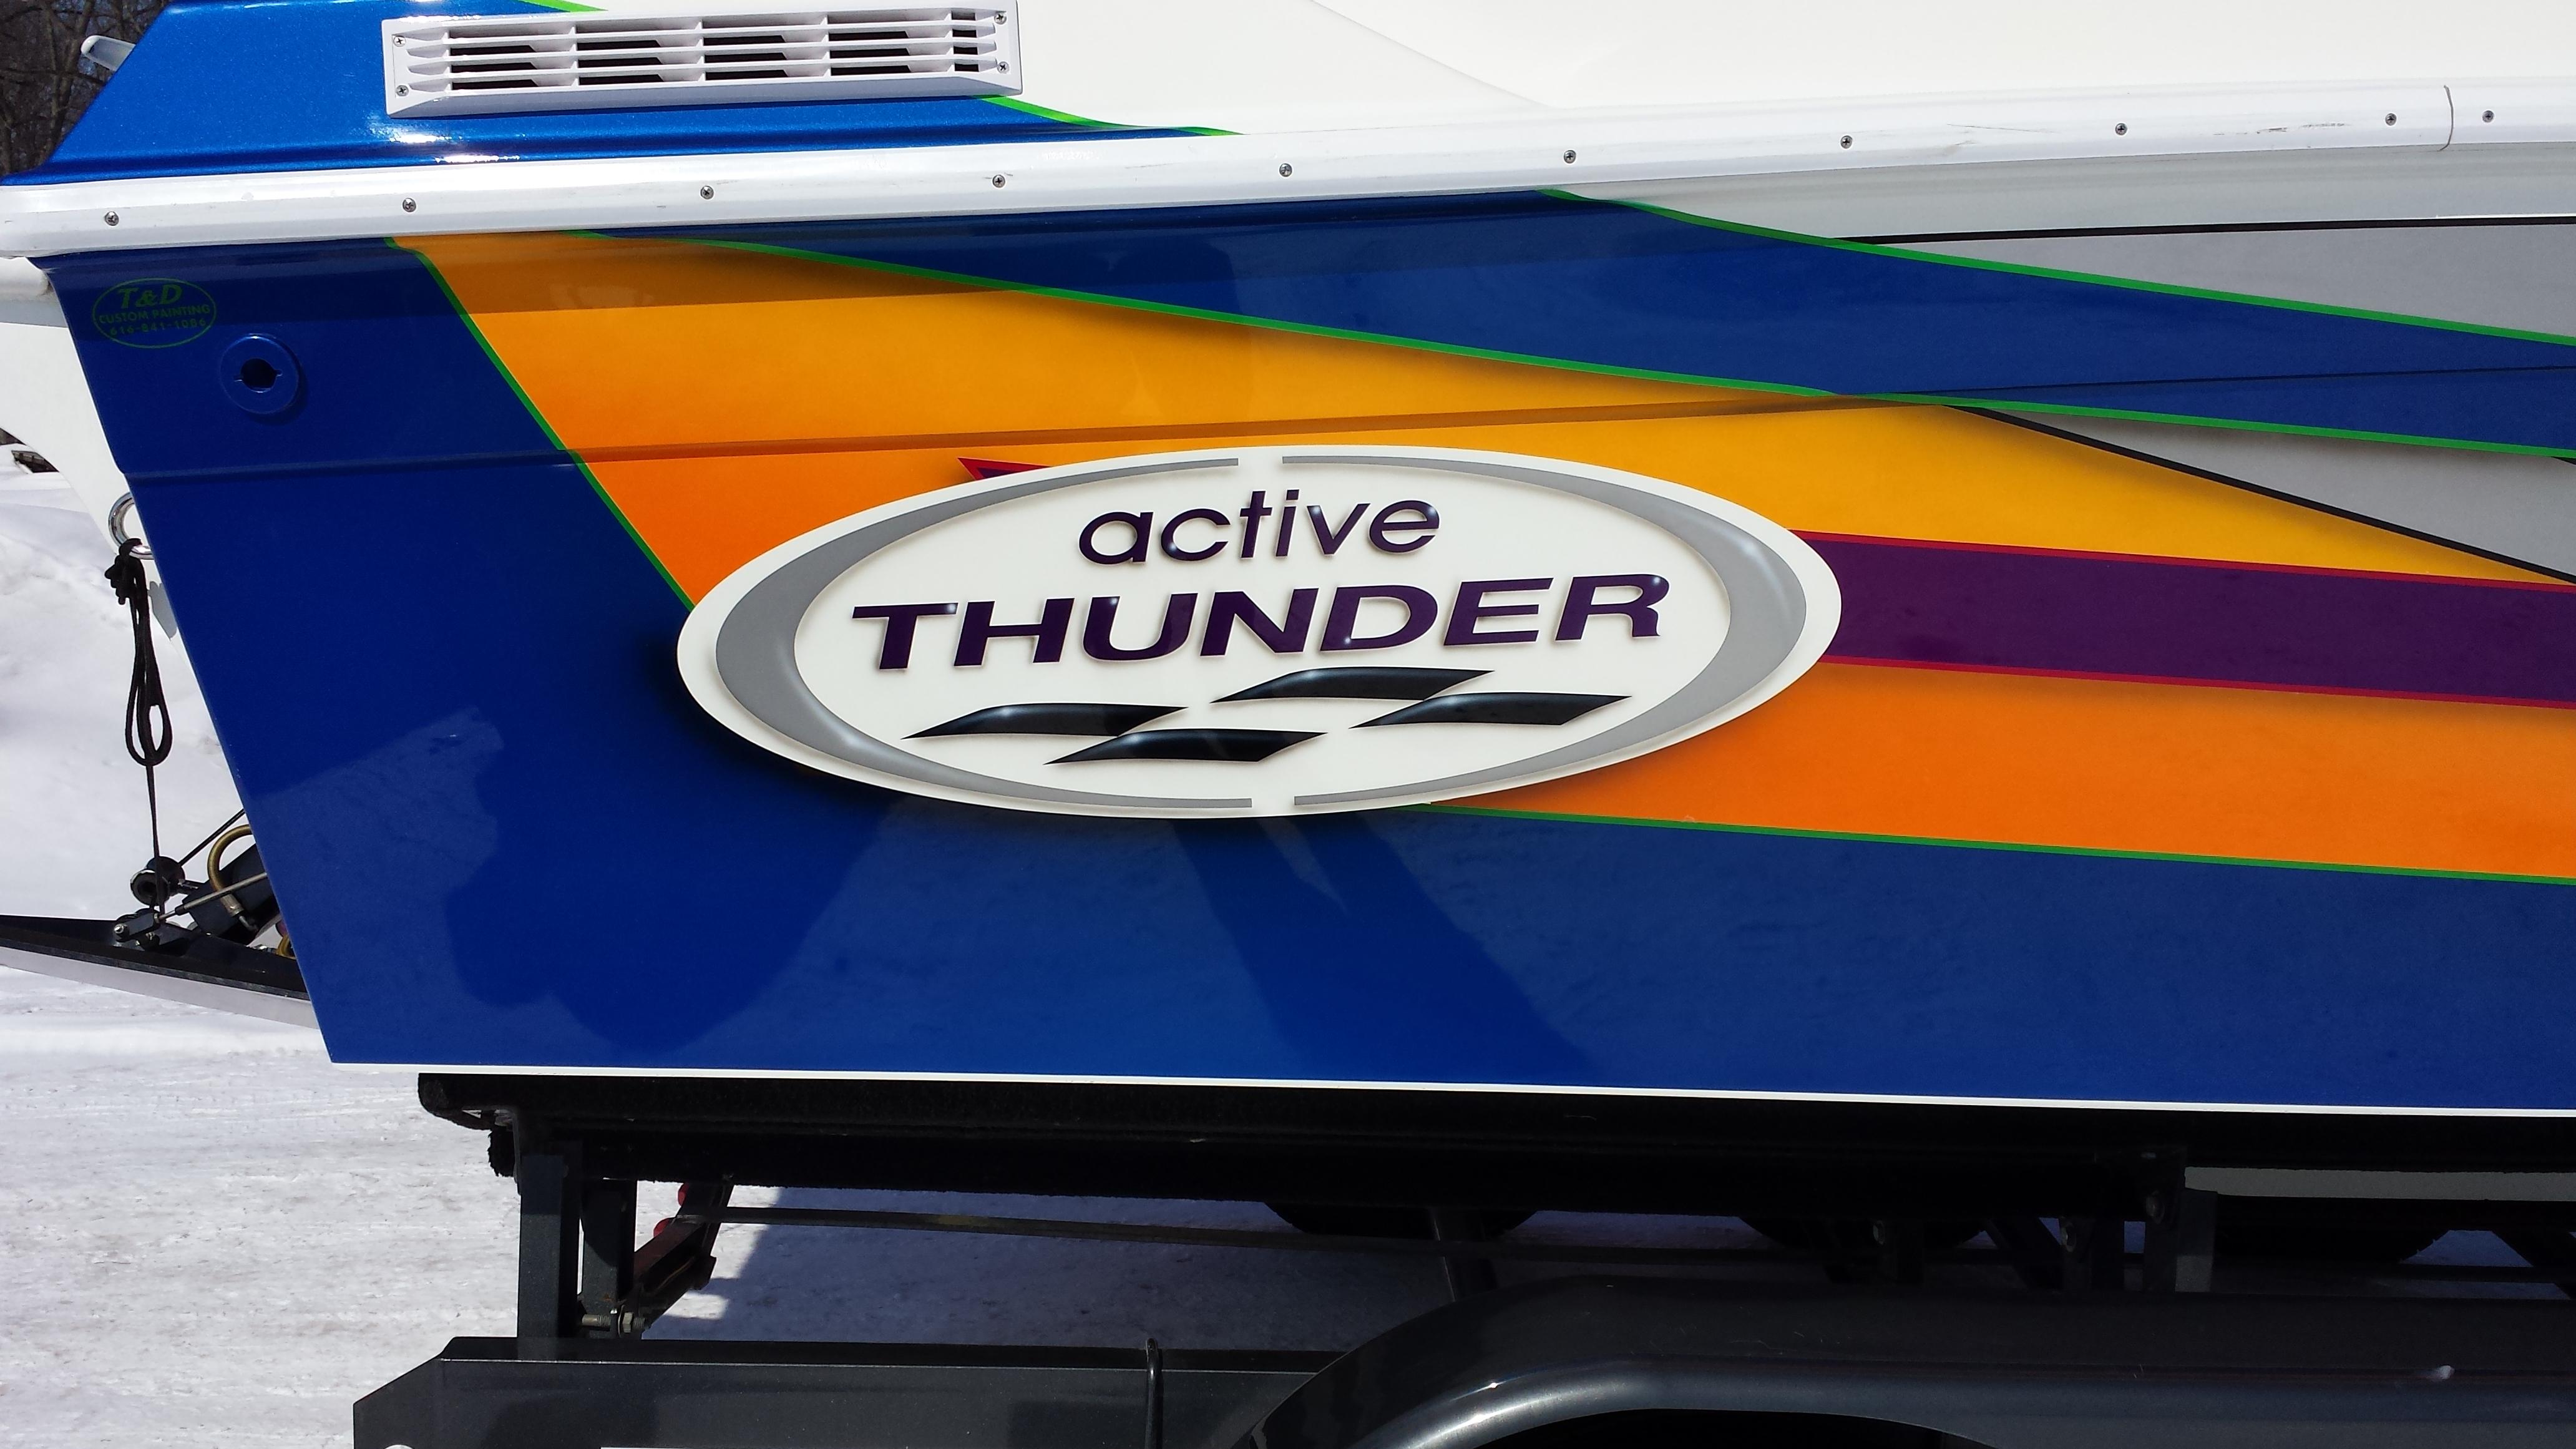 Active Thunder